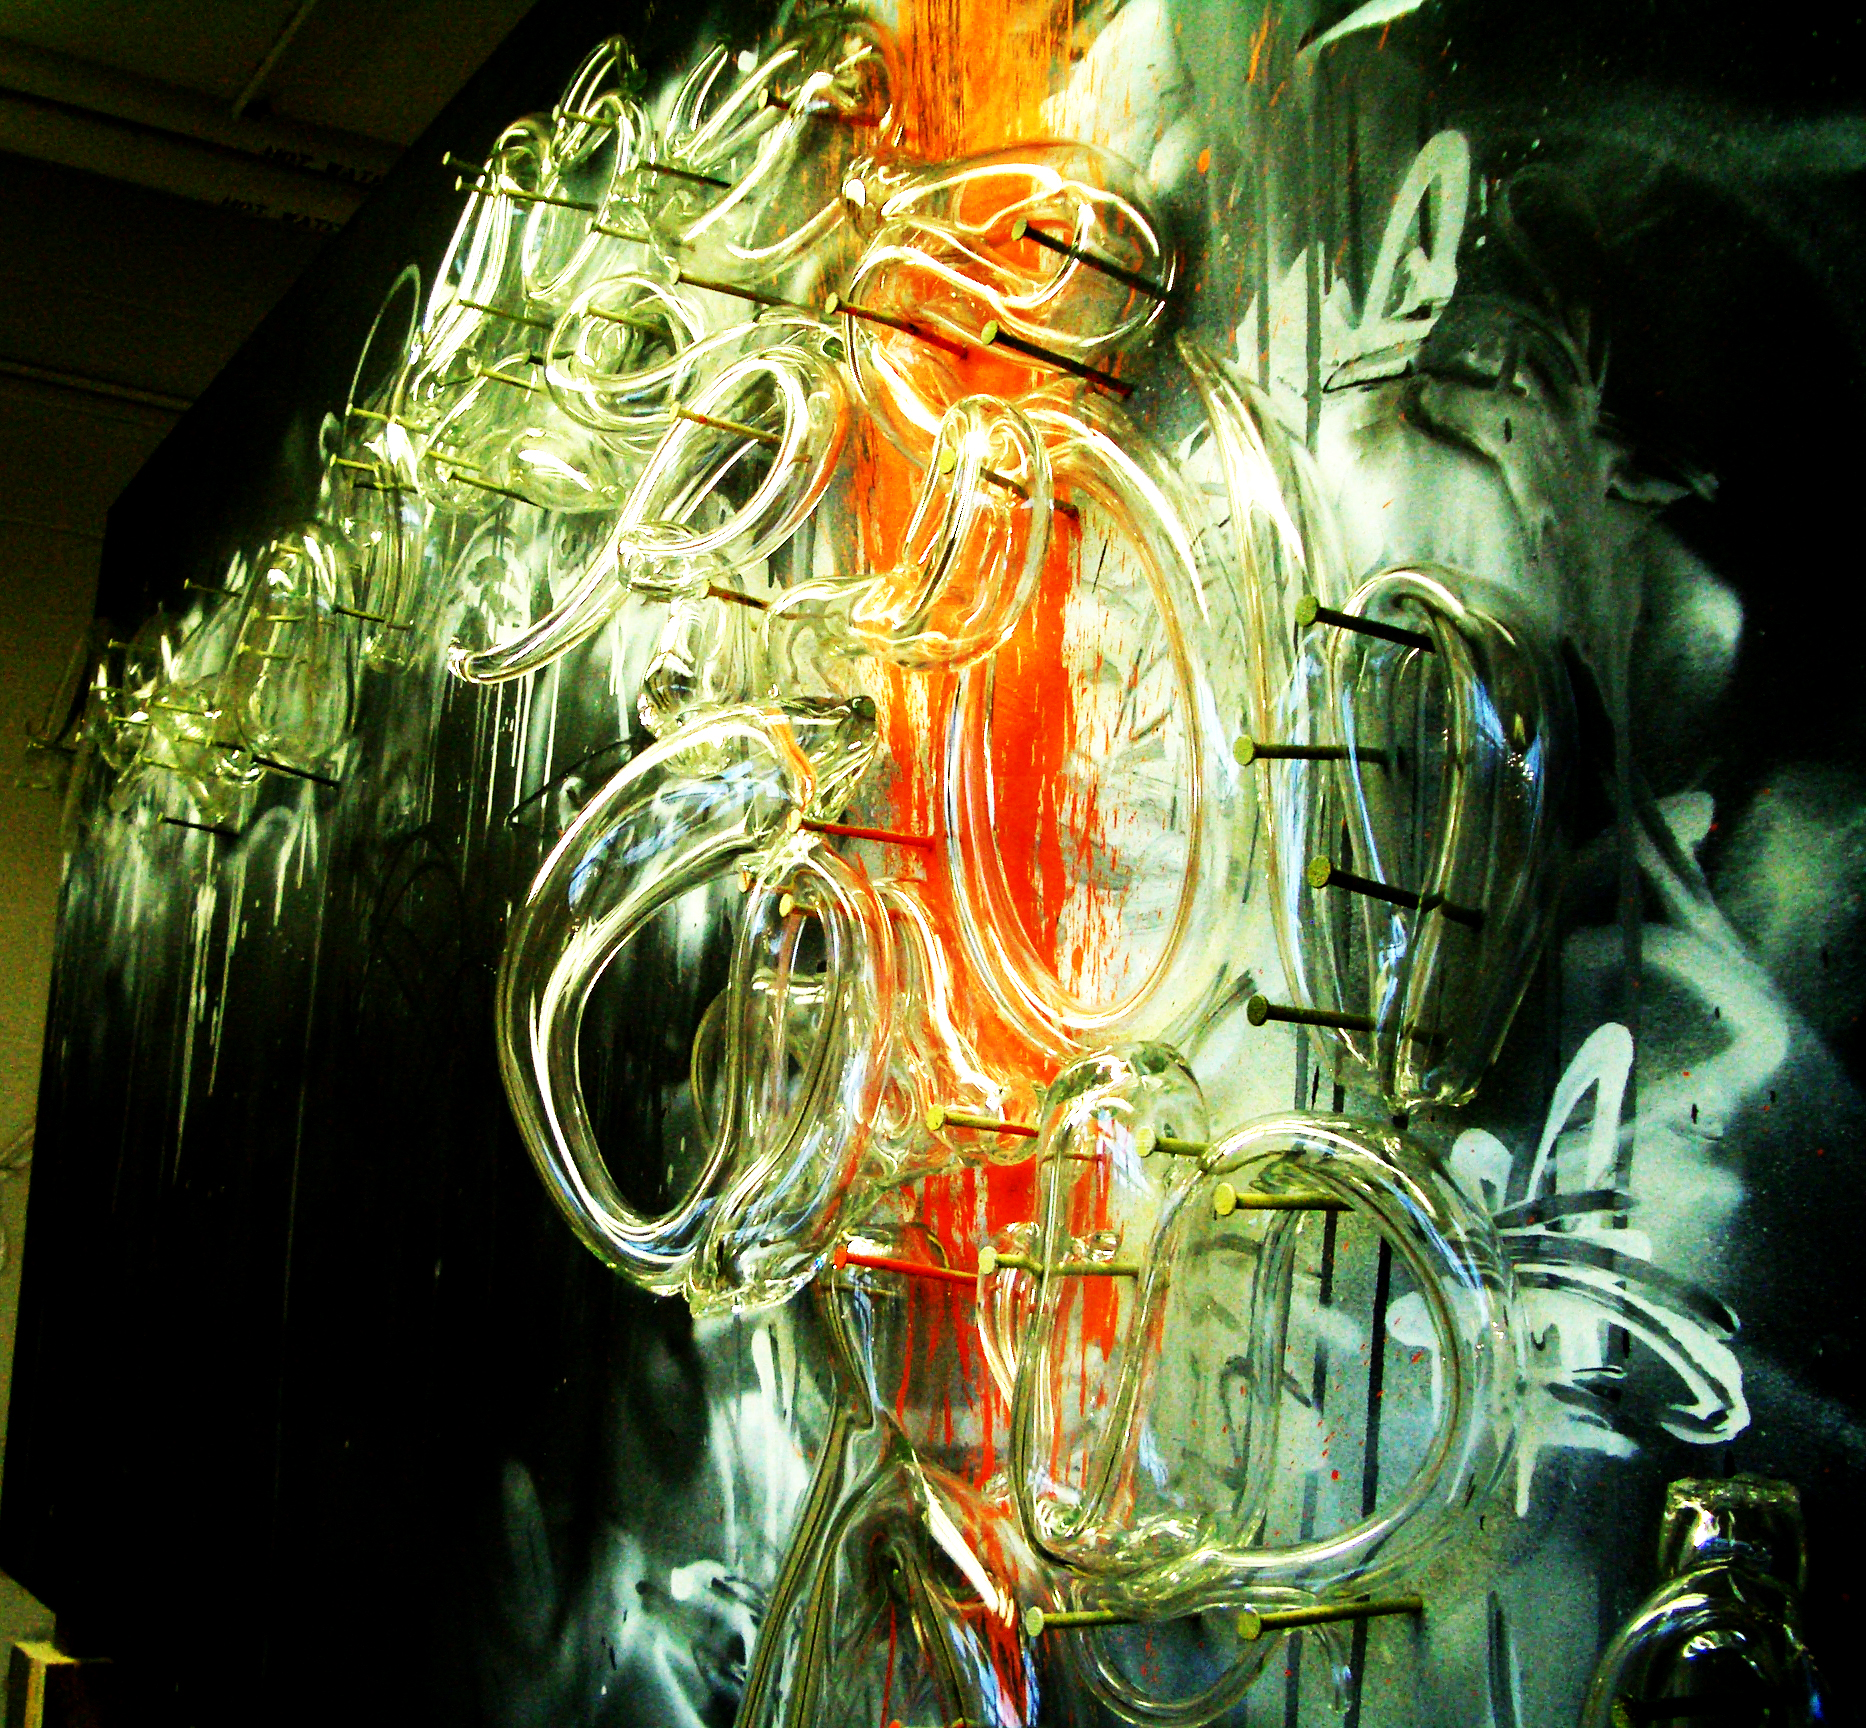 Bauer_Urban_Robert_Glass as Expressionism copy 2.JPG